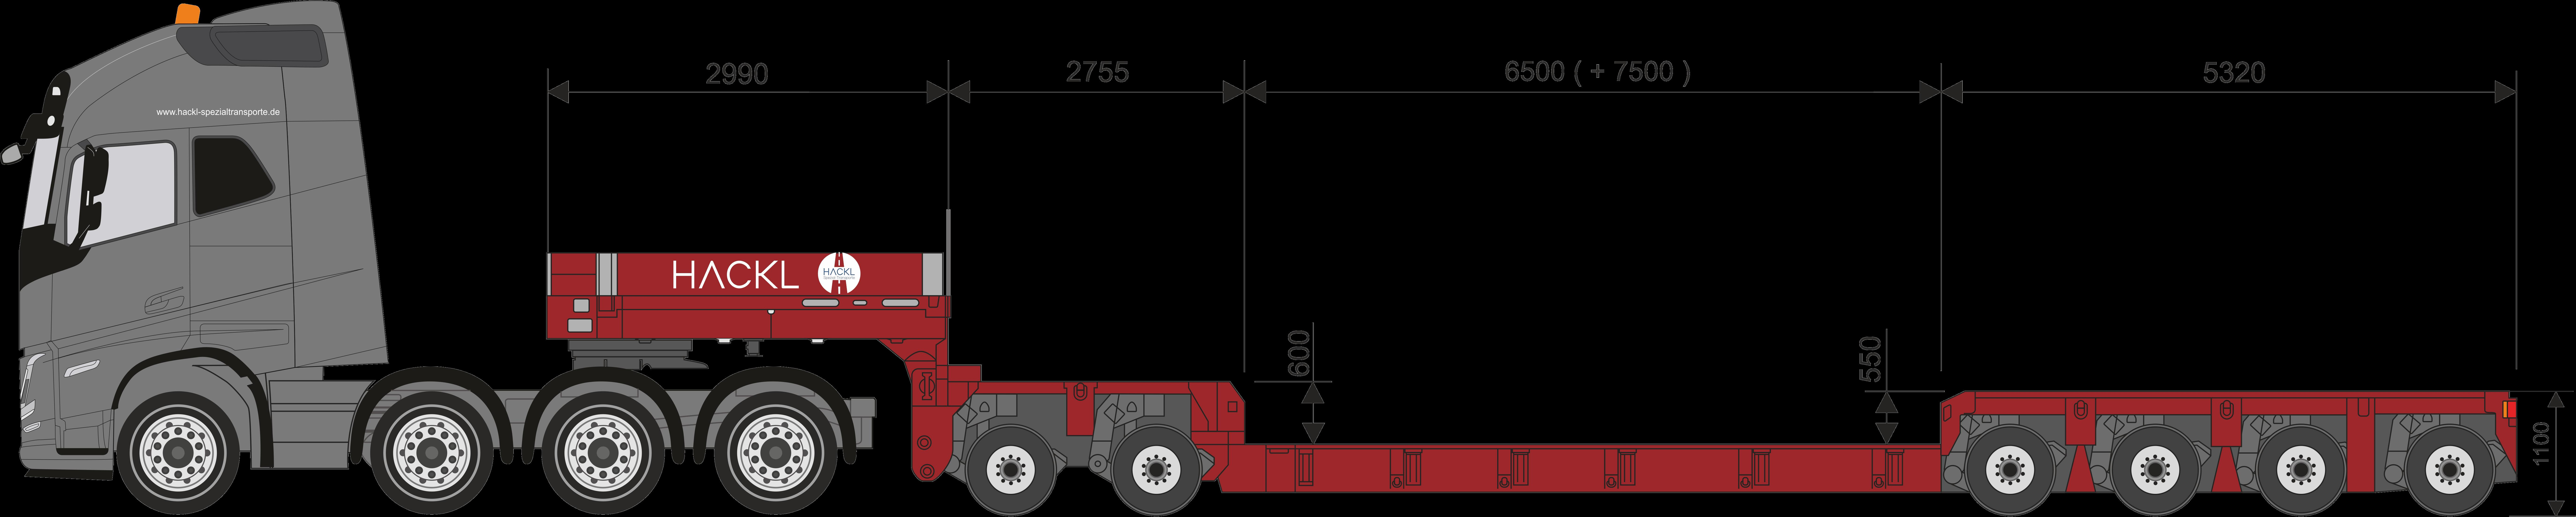 Hackl-Spezialtransporte200